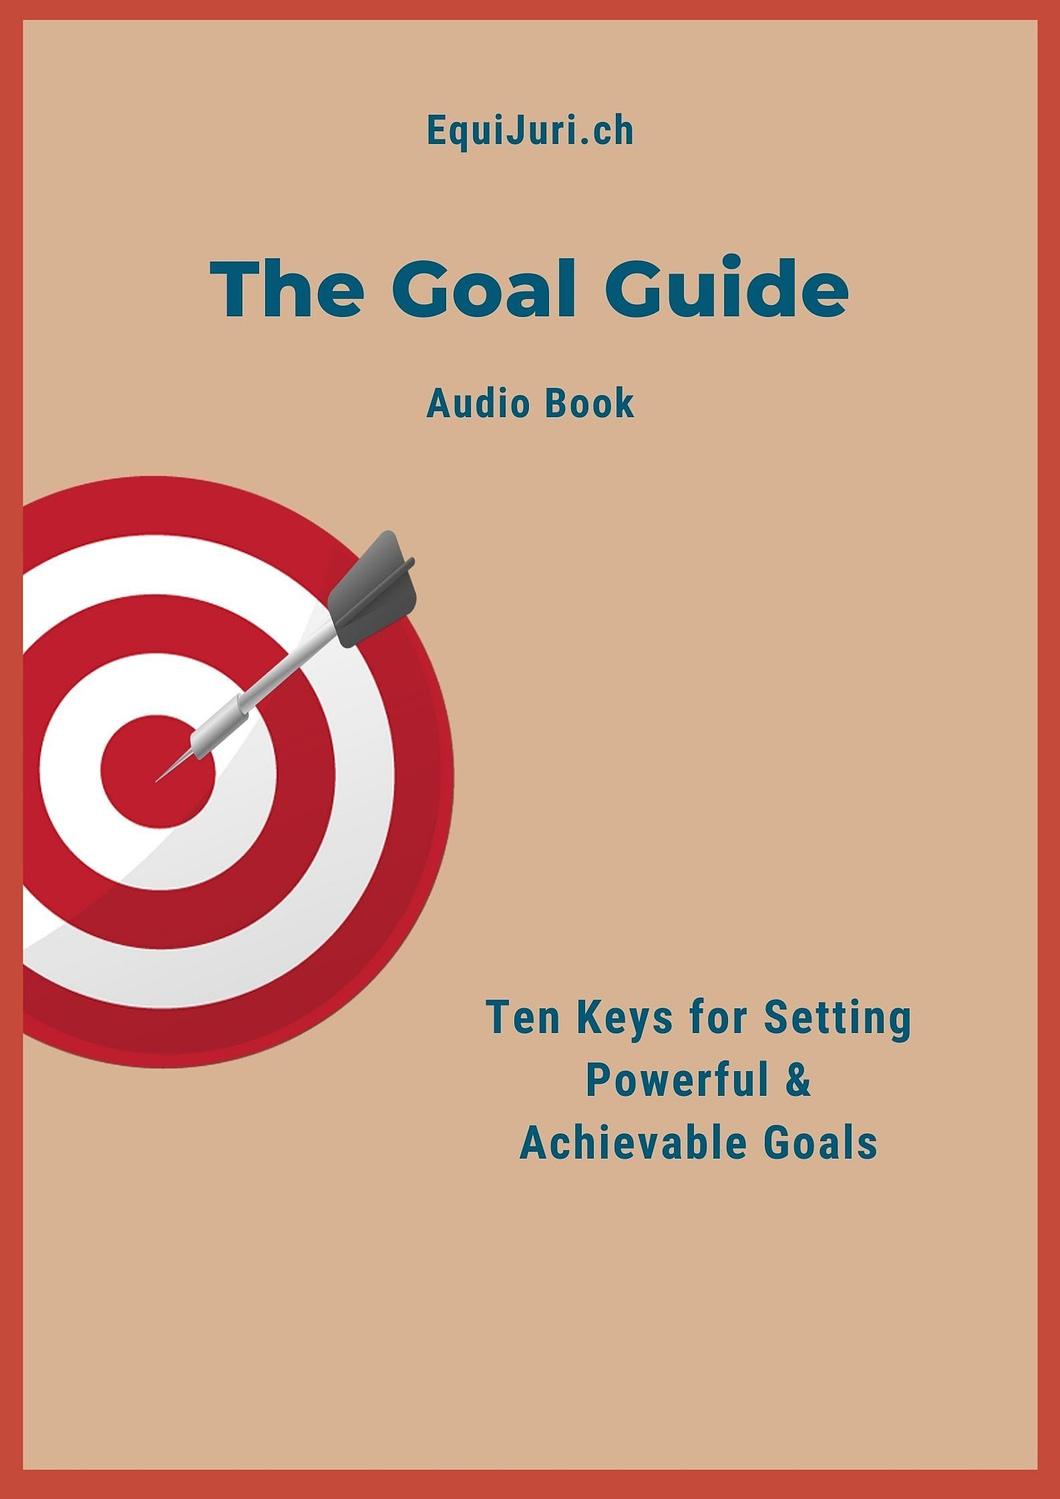 The Goal Guide EquiJuri